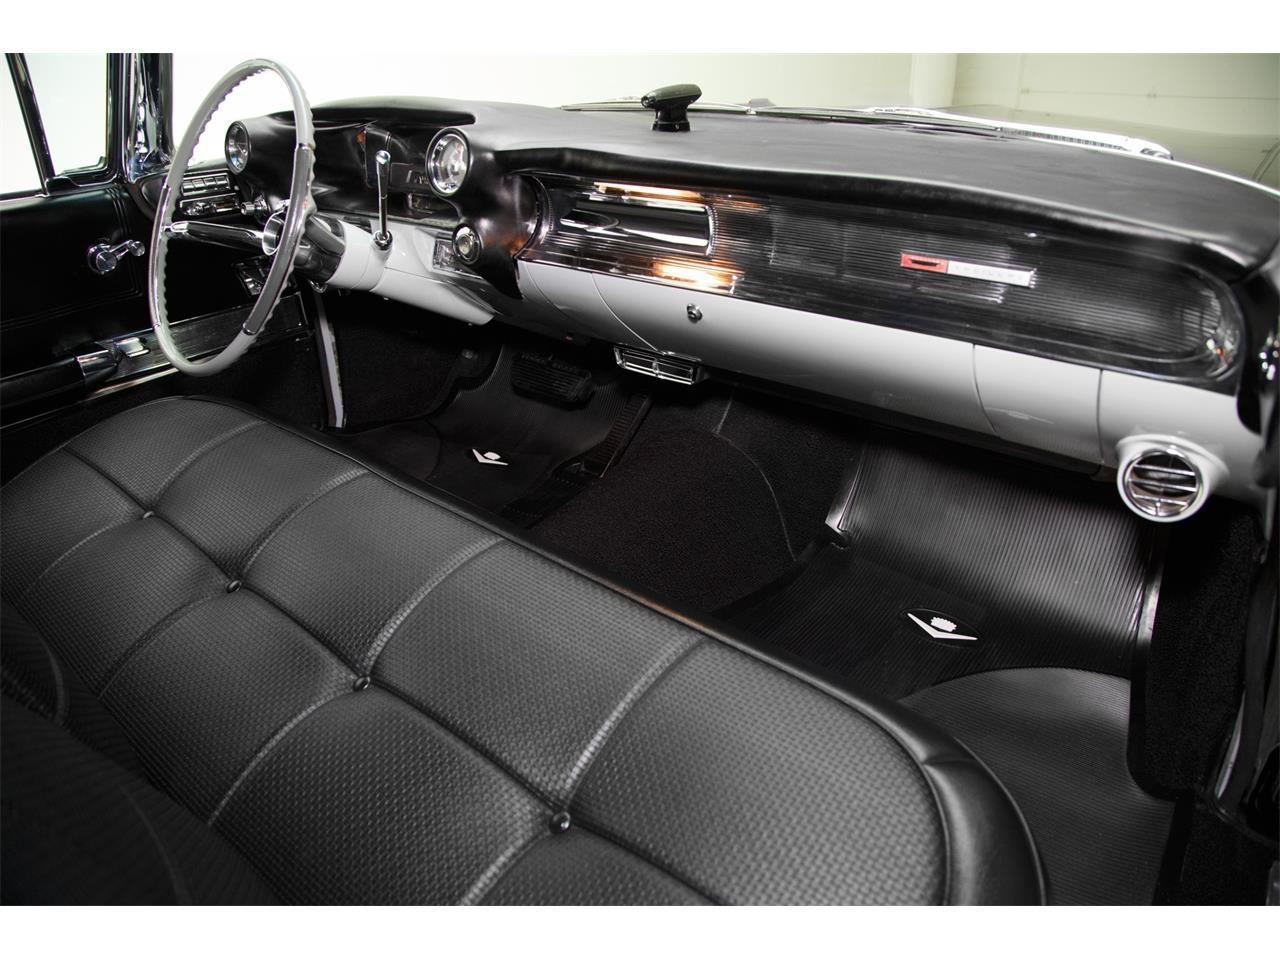 1960 Cadillac Fleetwood for Sale | ClassicCars.com | CC ...